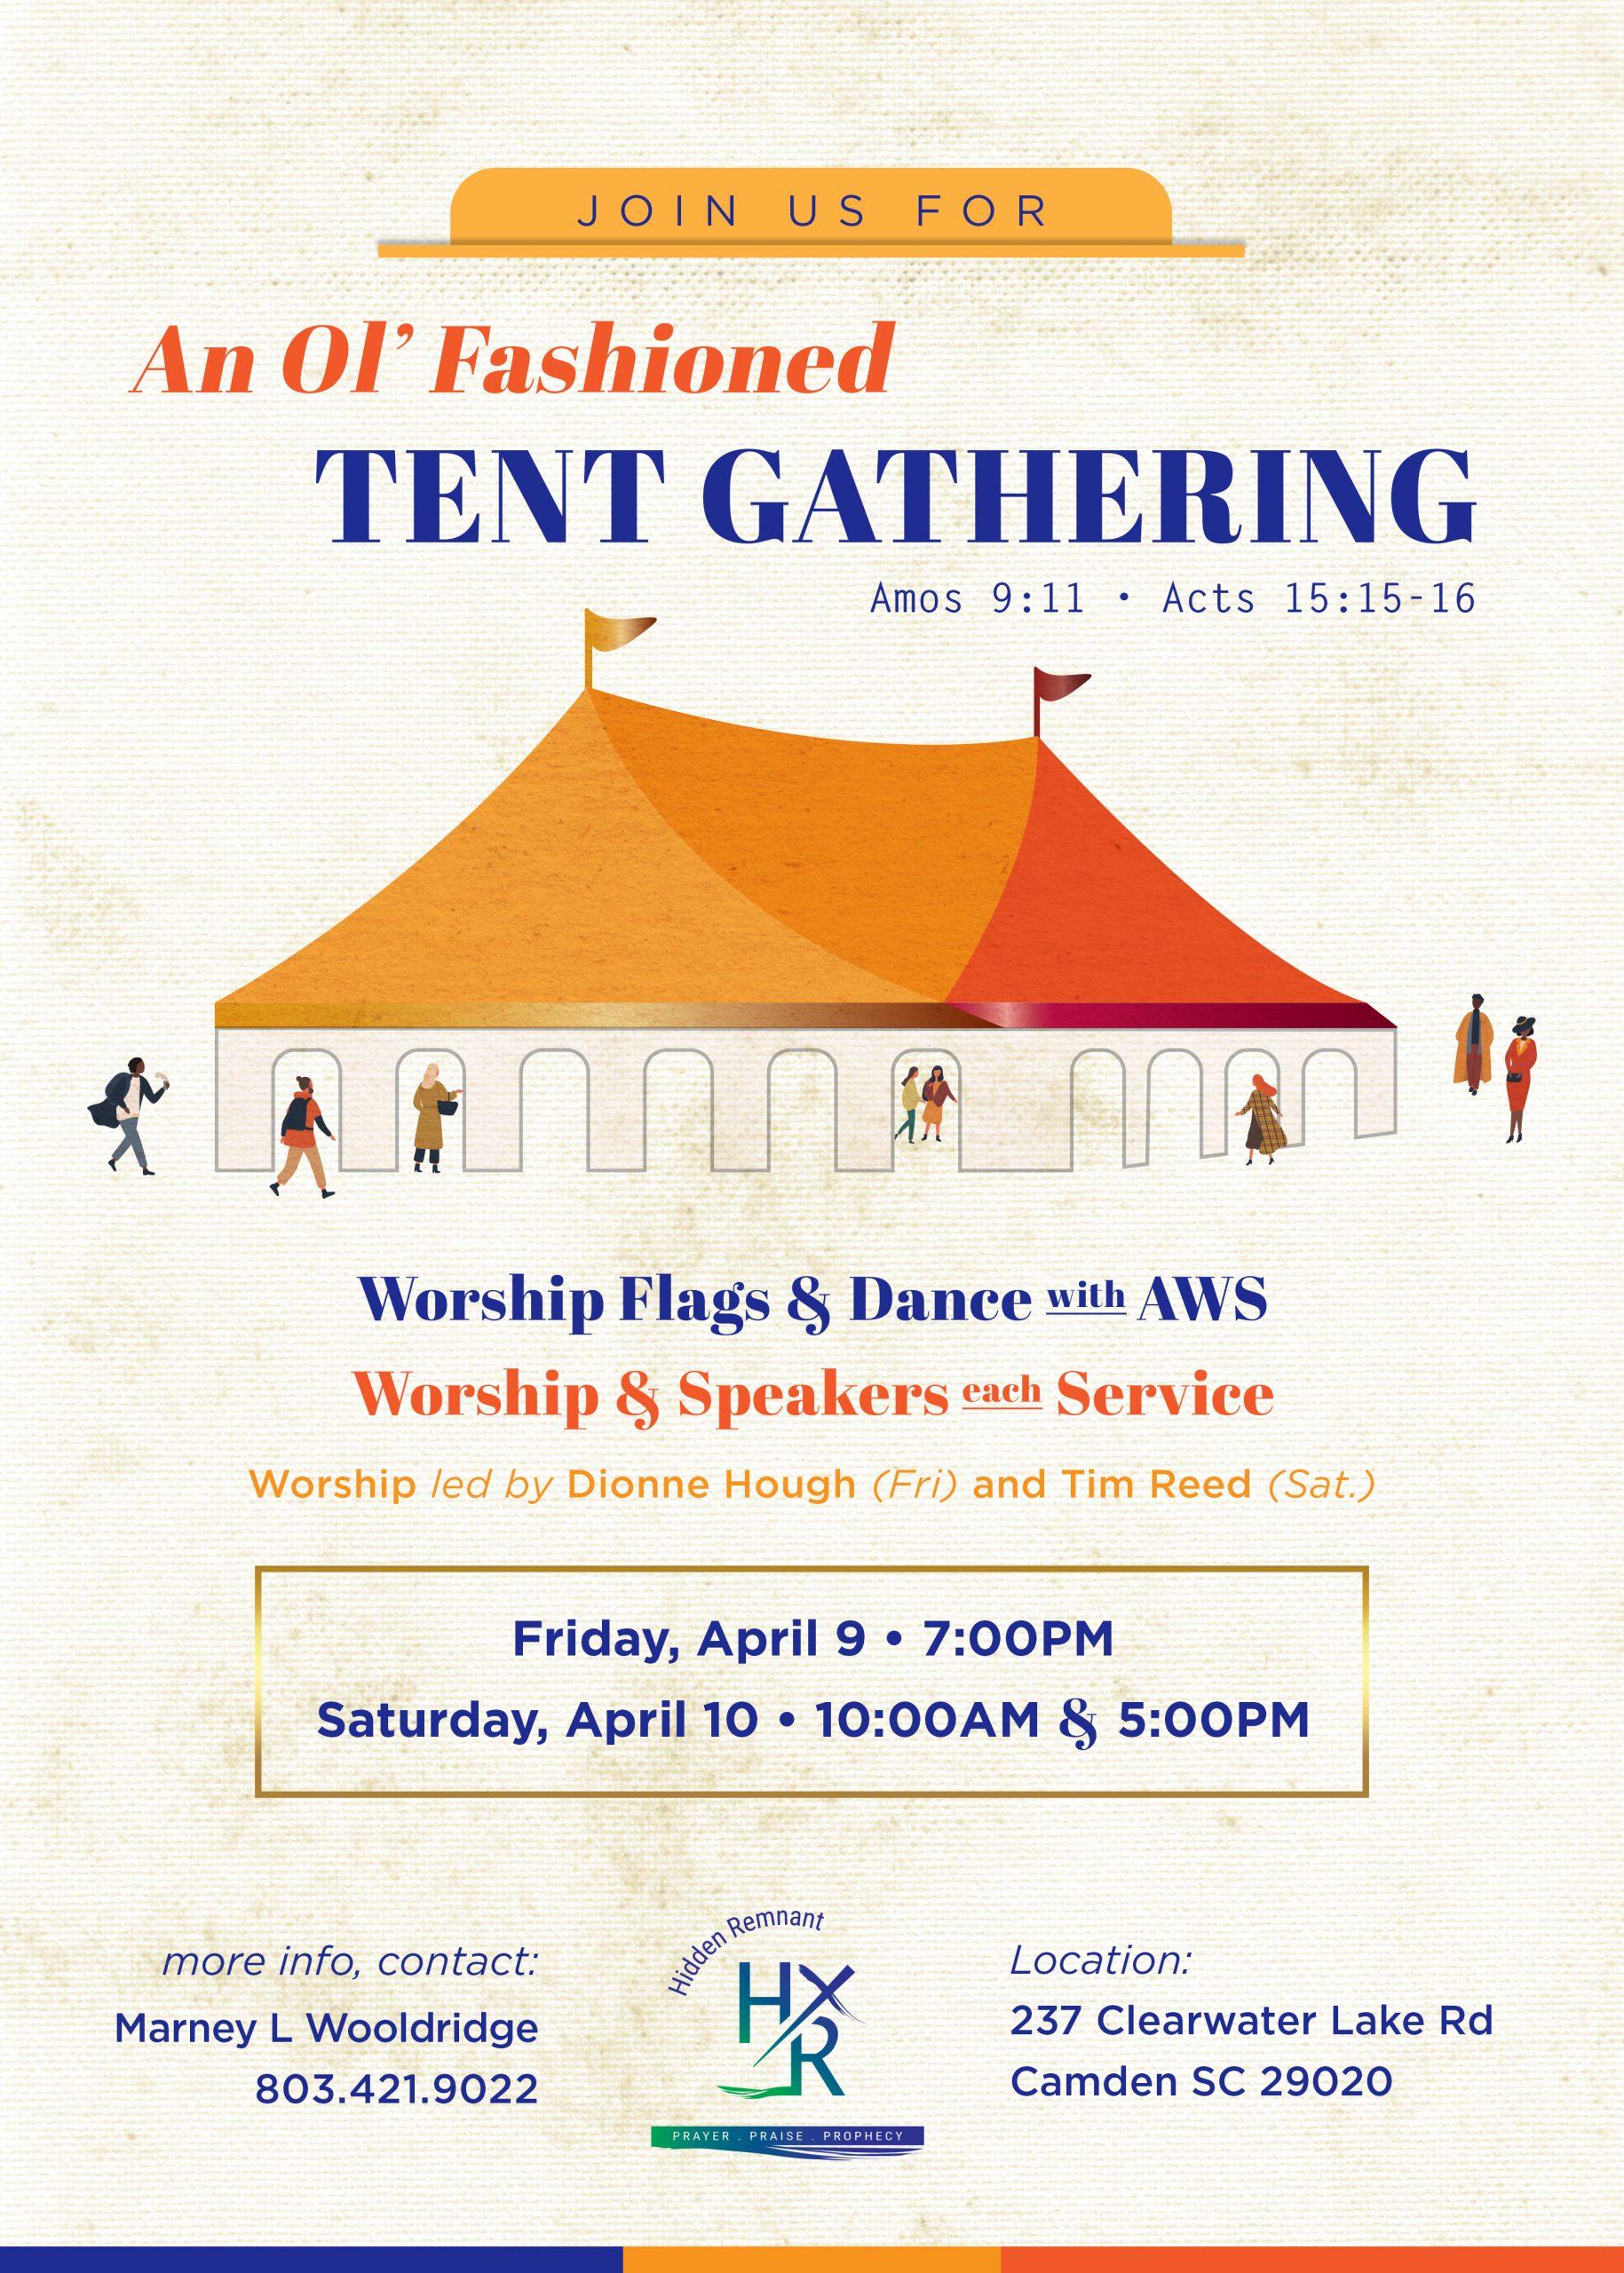 Tent Gathering